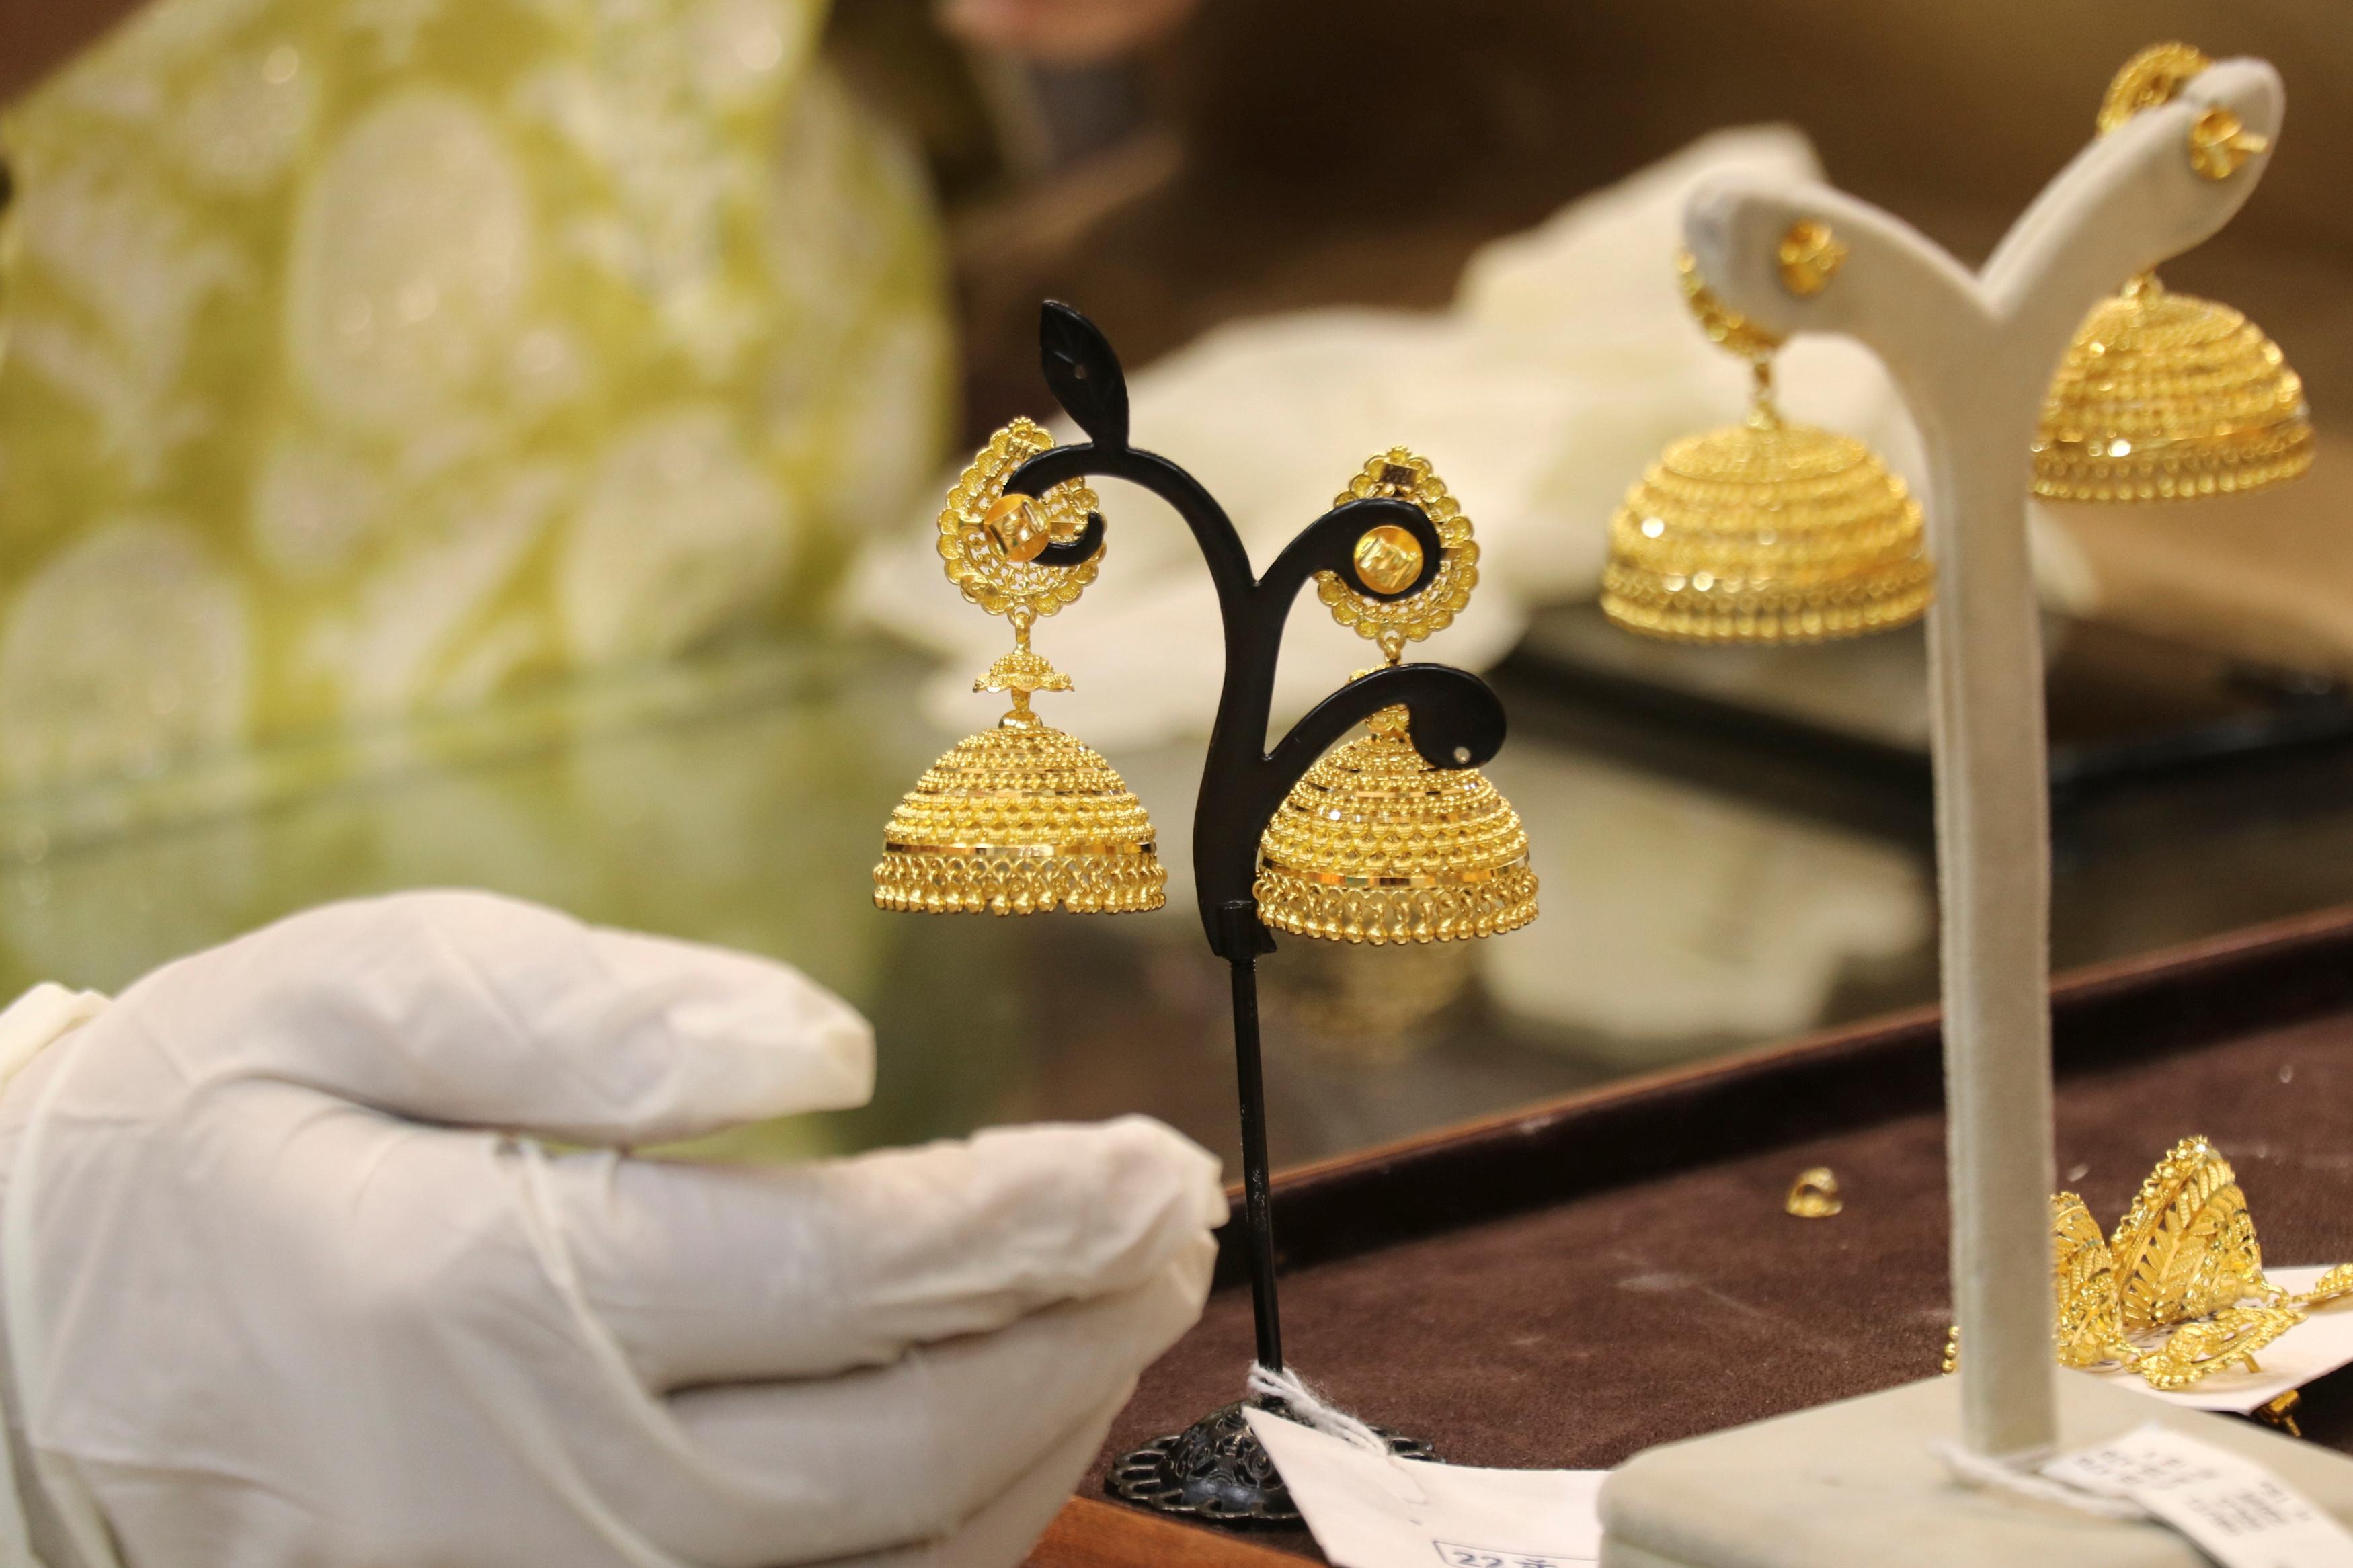 Customer looks at gold earrings at a jewellery showroom during Dhanteras, a Hindu festival associated with Lakshmi, the goddess of wealth, amidst the spread of COVID-19 in Mumbai, India, November 13, 2020. REUTERS/Niharika Kulkarni/File photo